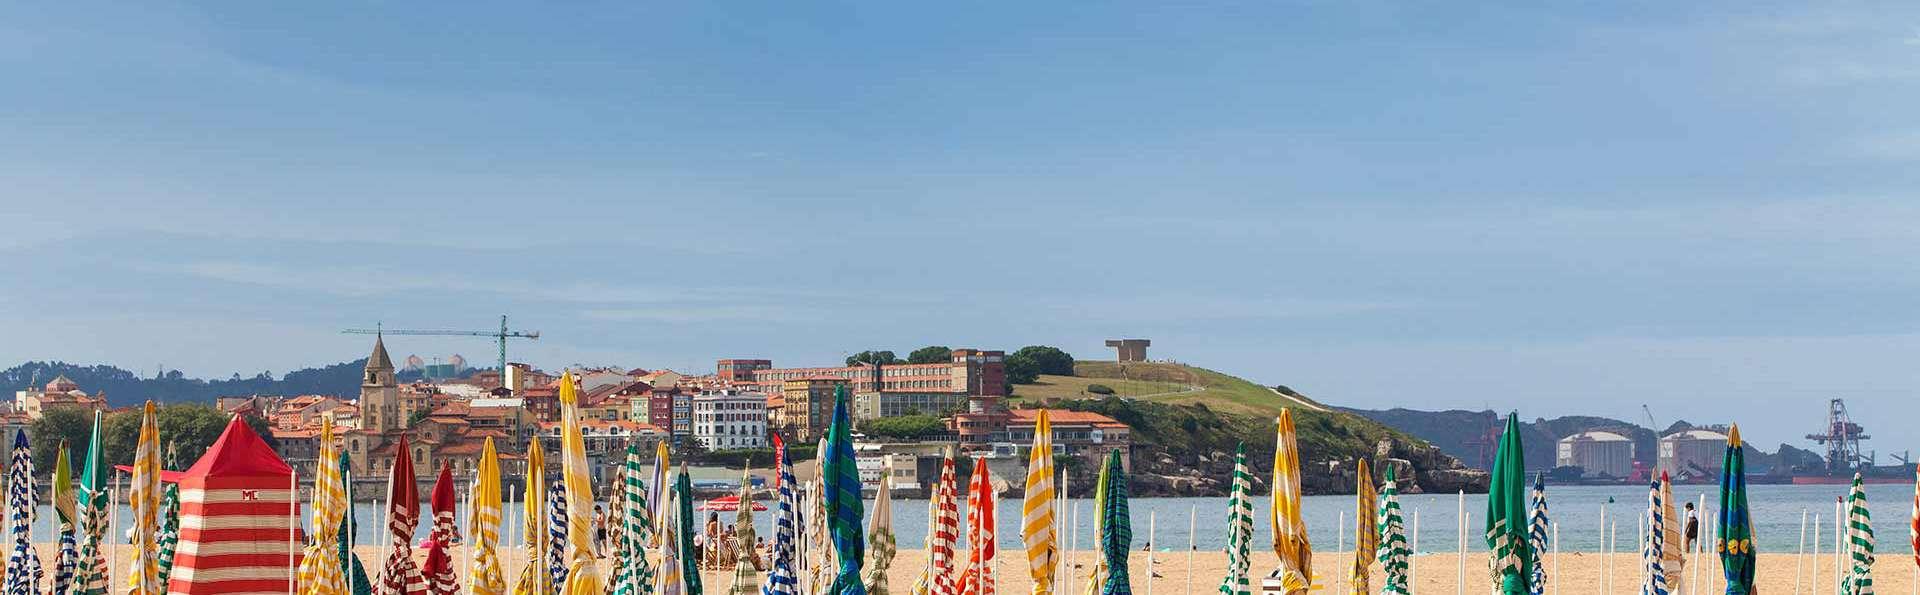 ABBA Playa Gijón - EDIT_DESTINATION_01.jpg